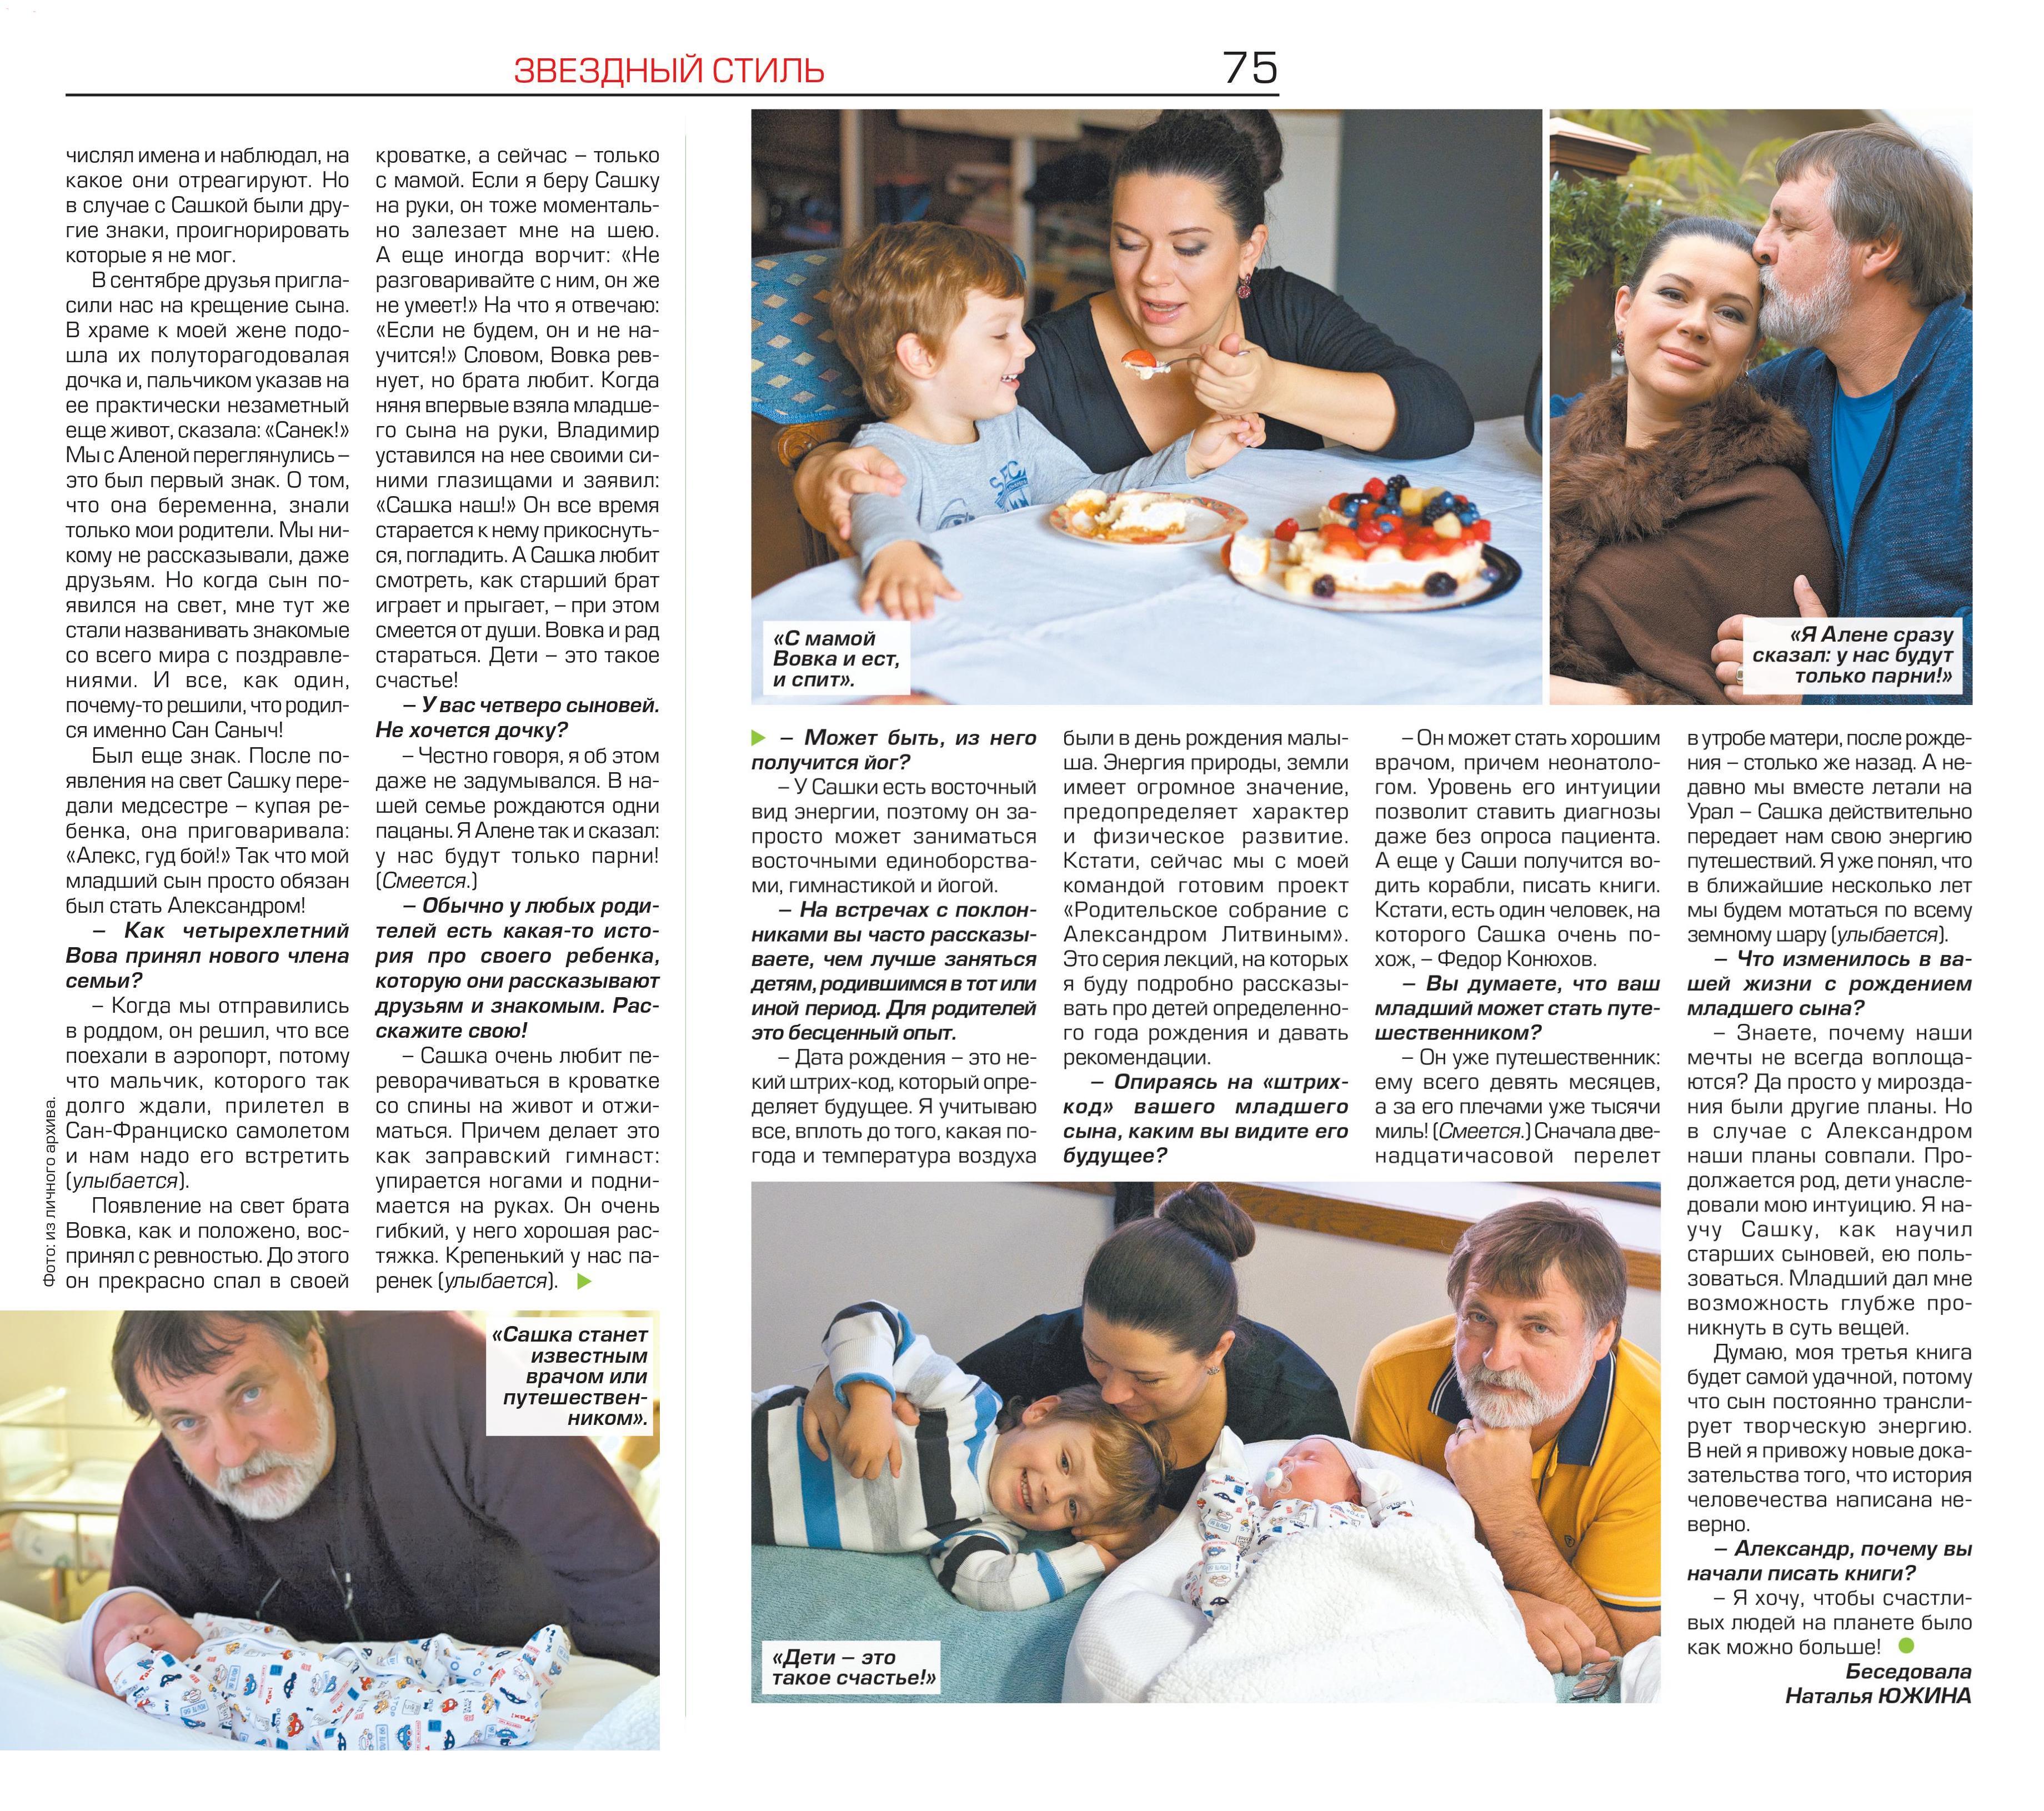 Литвин александр и его дети фото